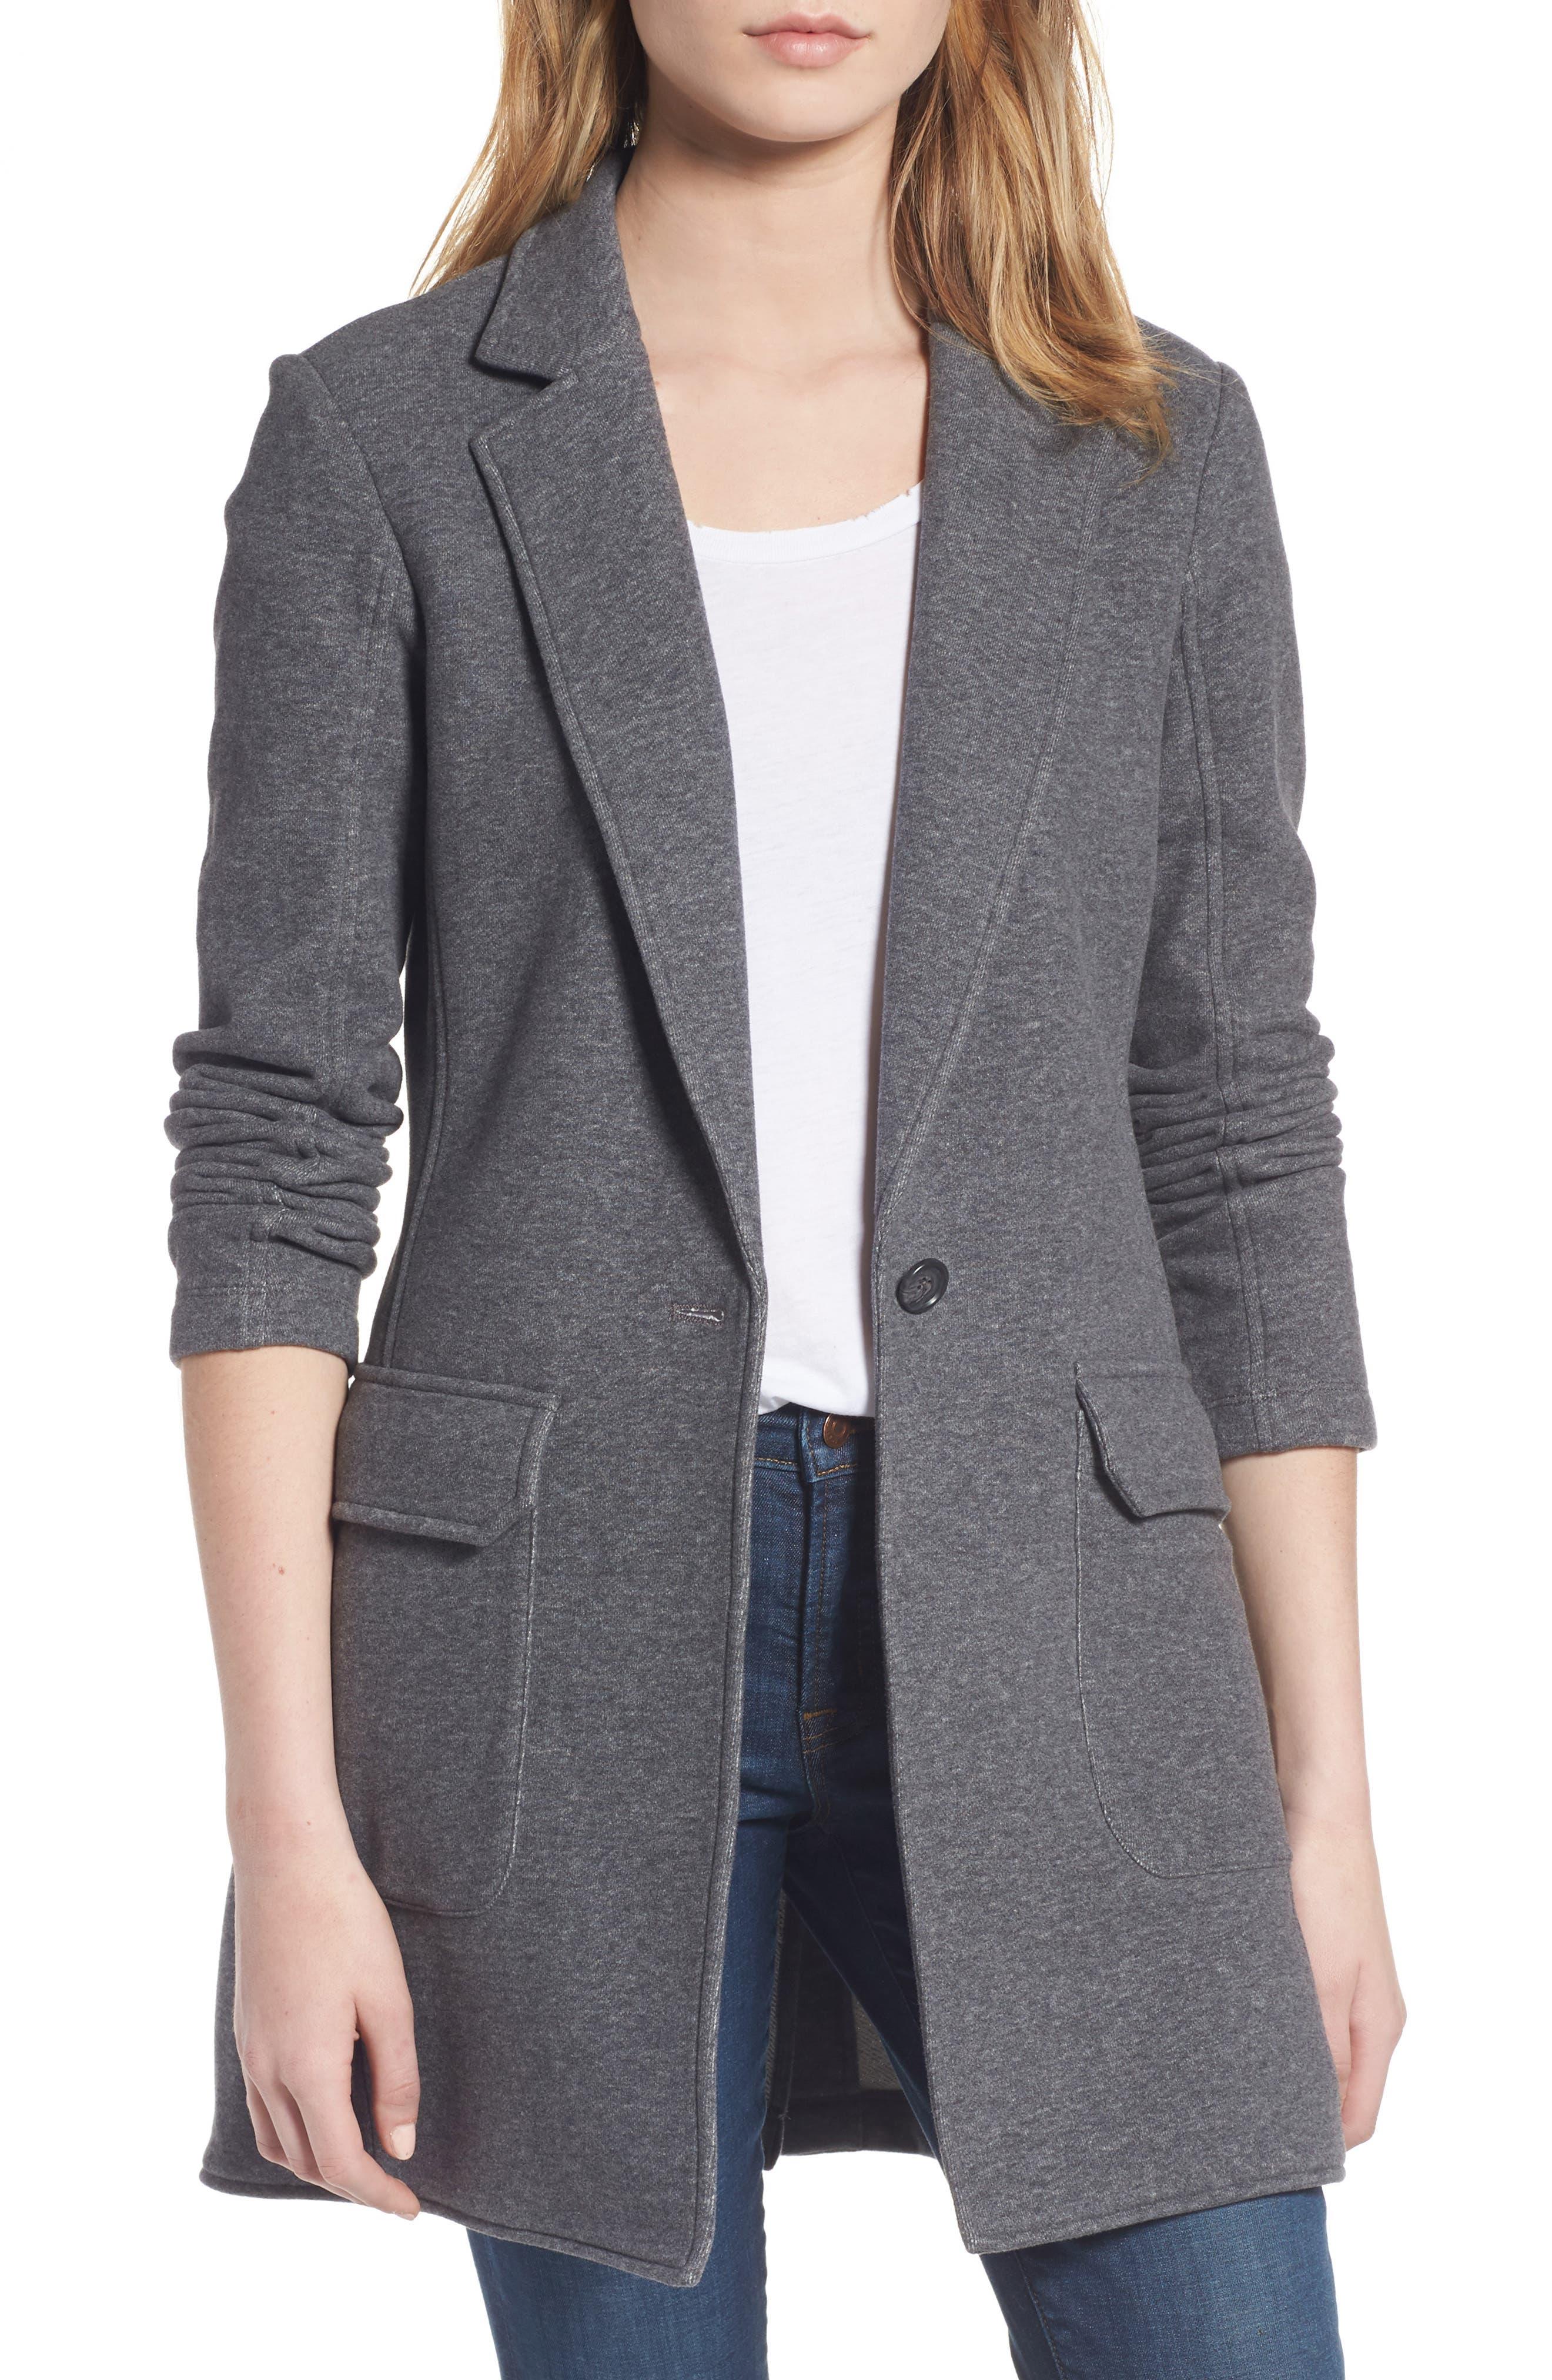 James Perse Brushed Fleece Long Jacket